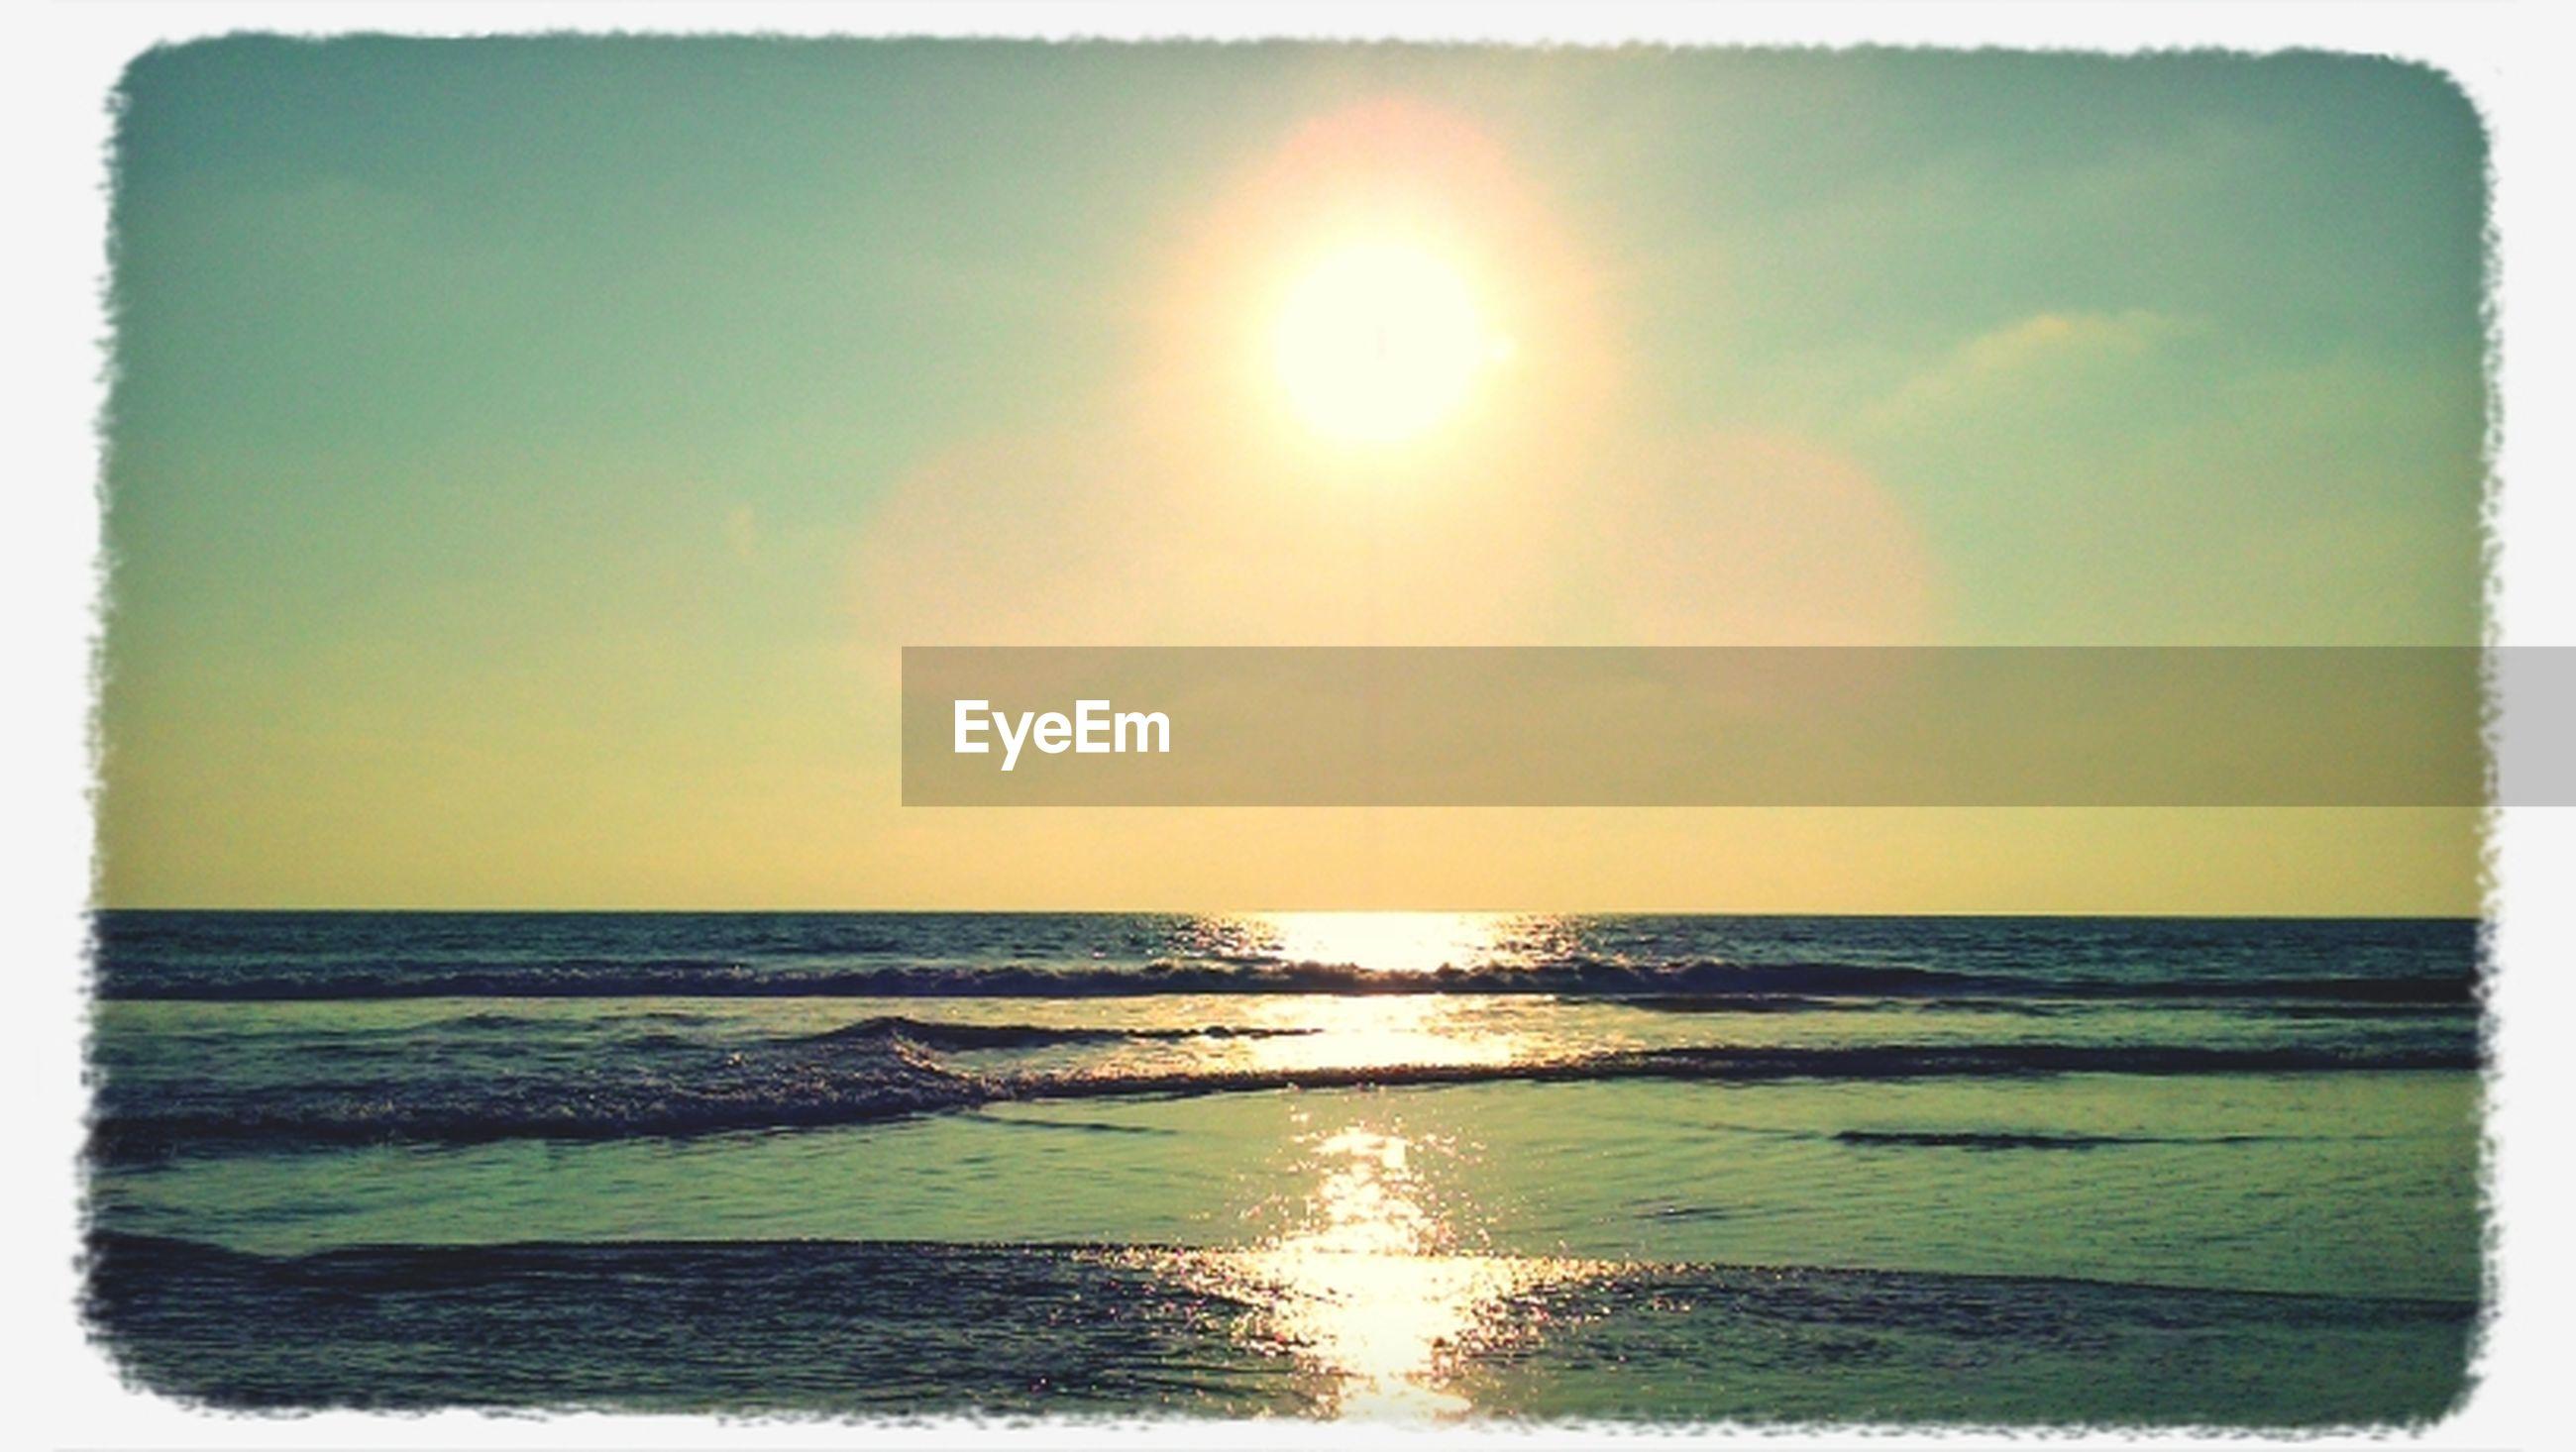 sea, horizon over water, water, transfer print, sun, scenics, tranquil scene, sunset, tranquility, beauty in nature, beach, sky, auto post production filter, reflection, idyllic, shore, nature, sunlight, sunbeam, seascape